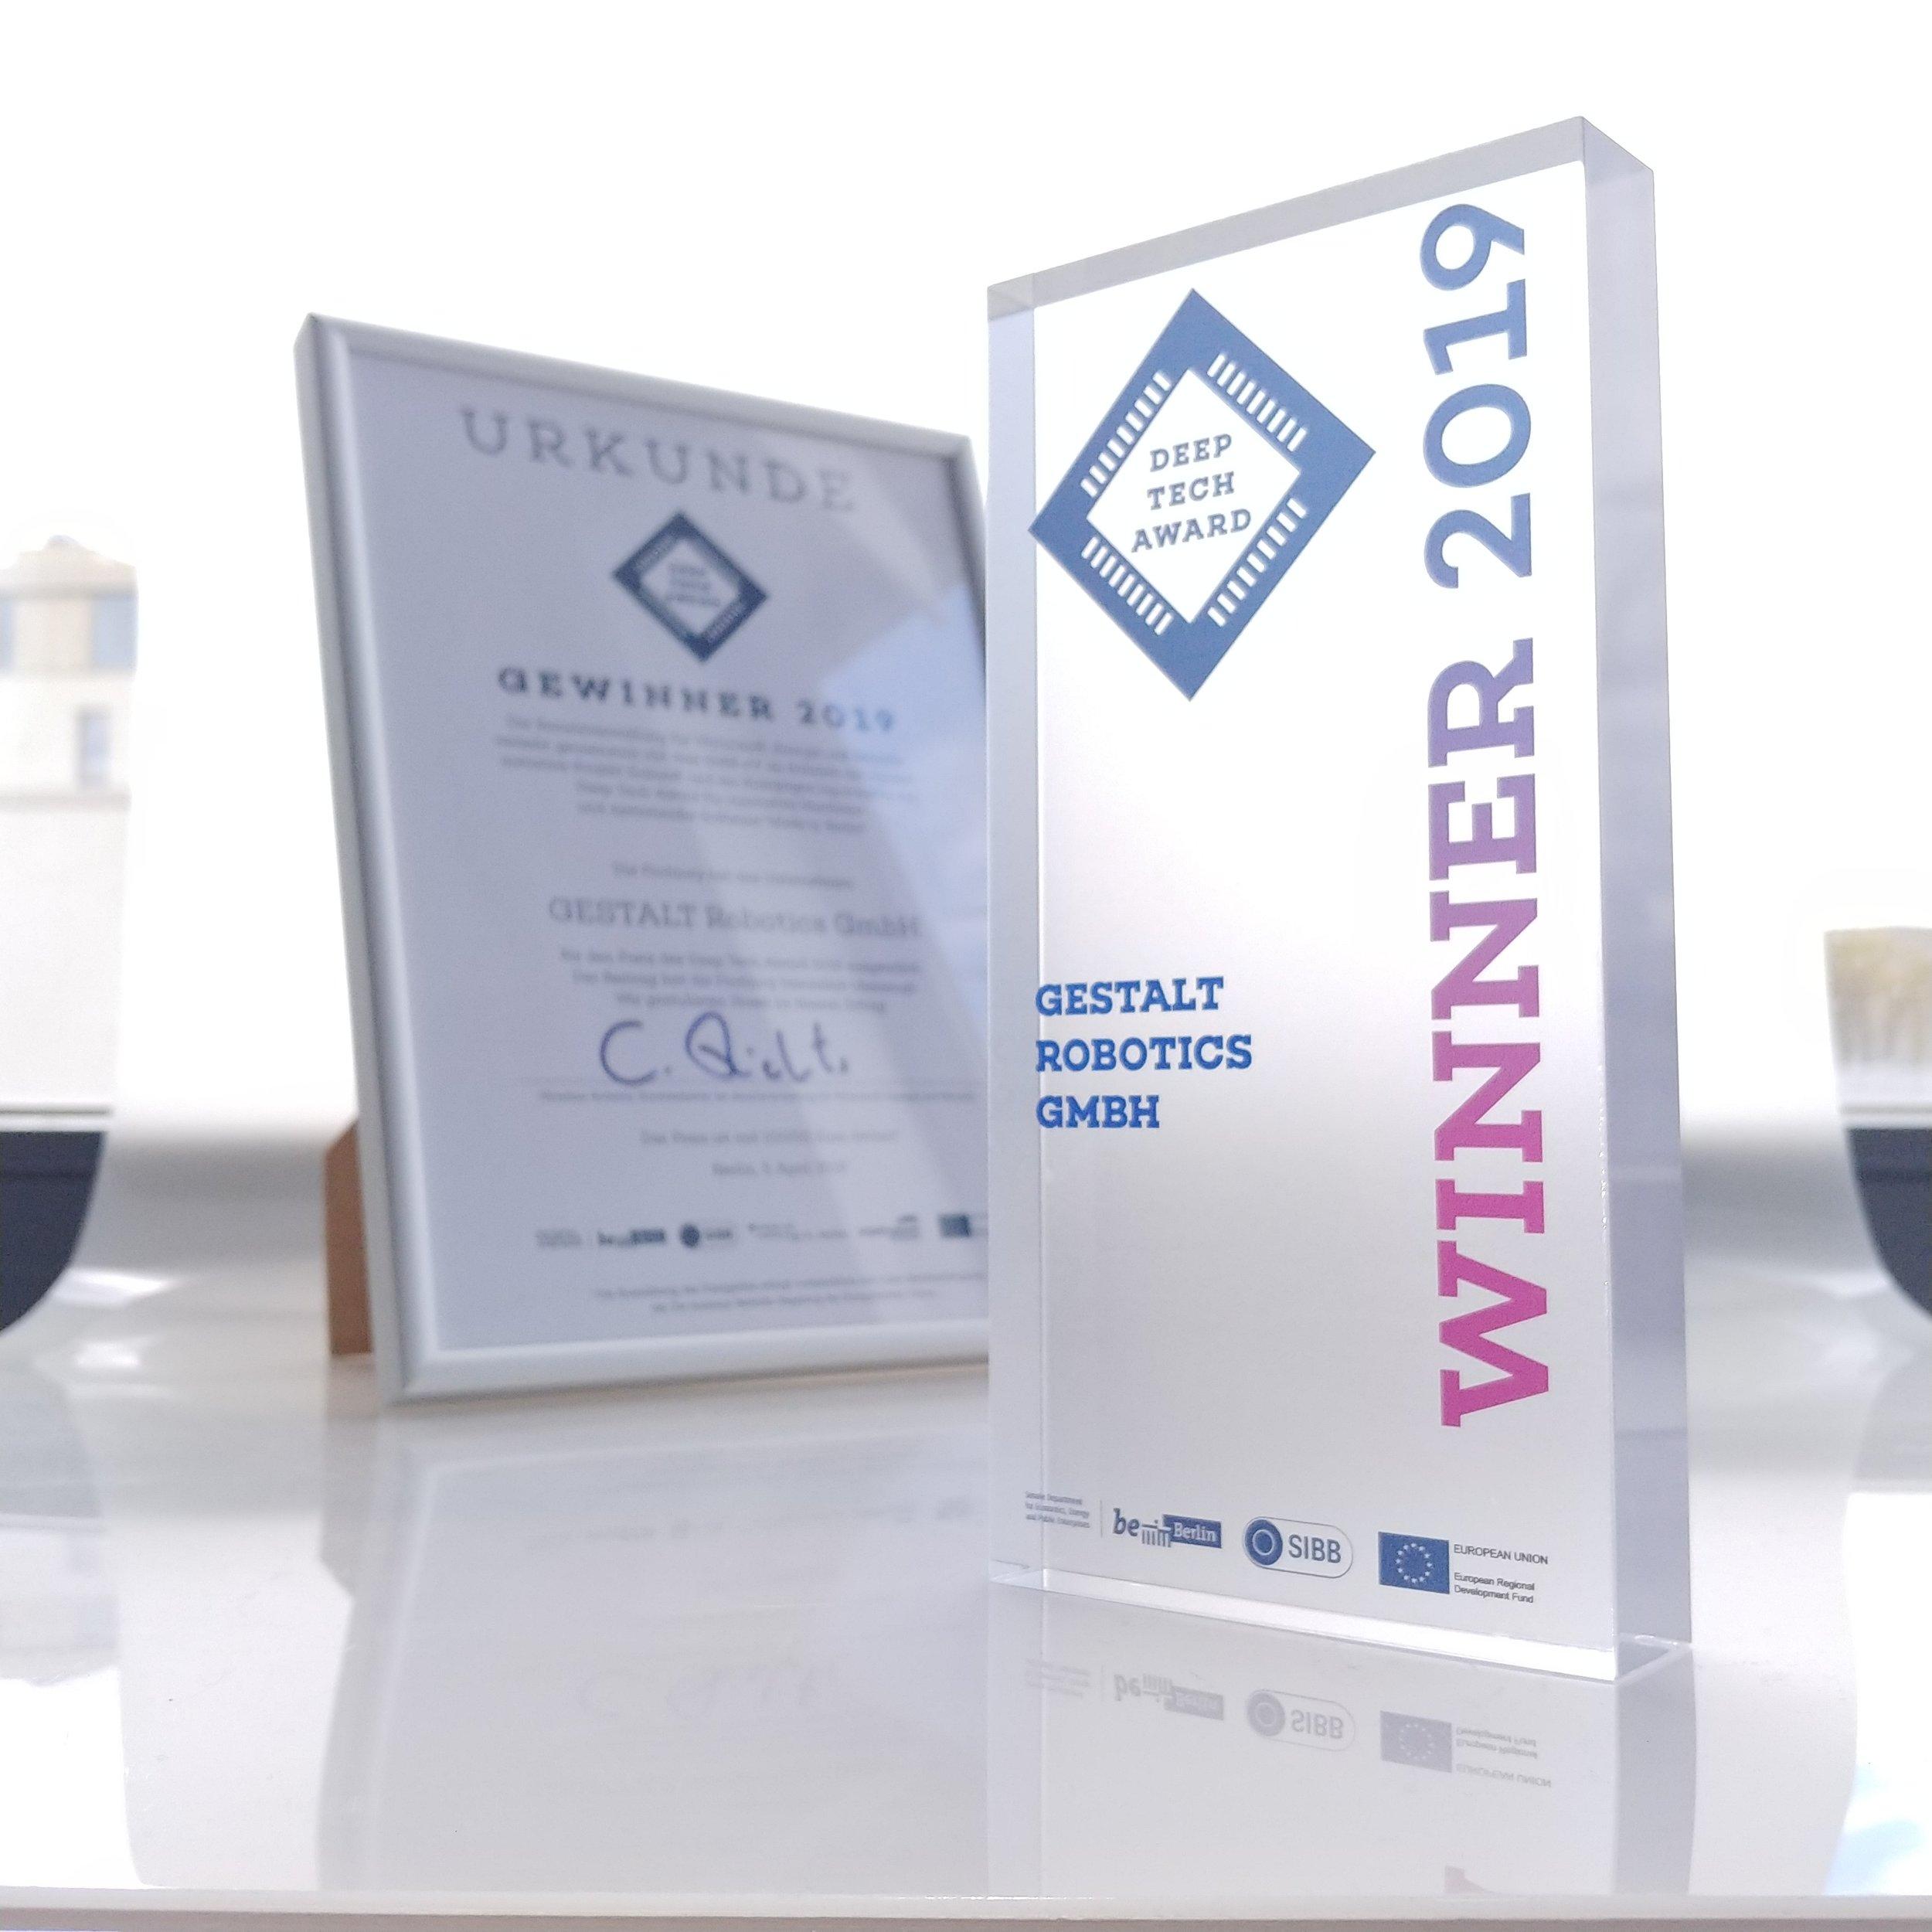 Appreciated amongst experts: EPIC won the Deep Tech Award 2019